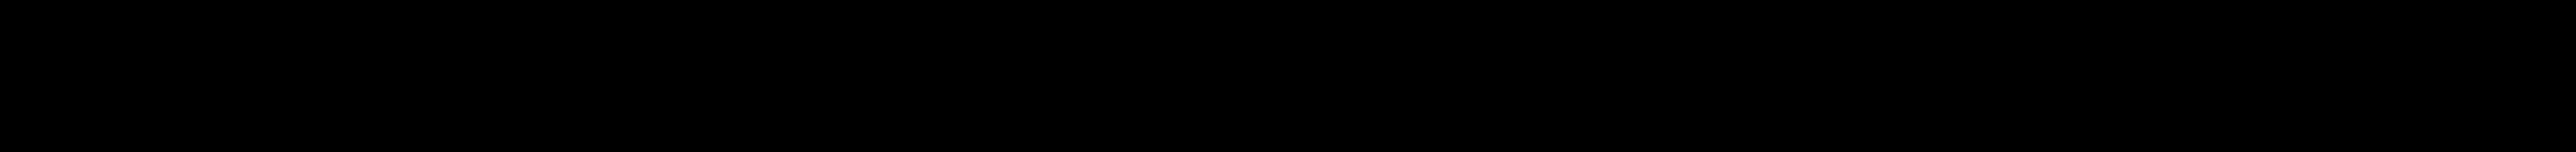 logo capucine CMP simple noir